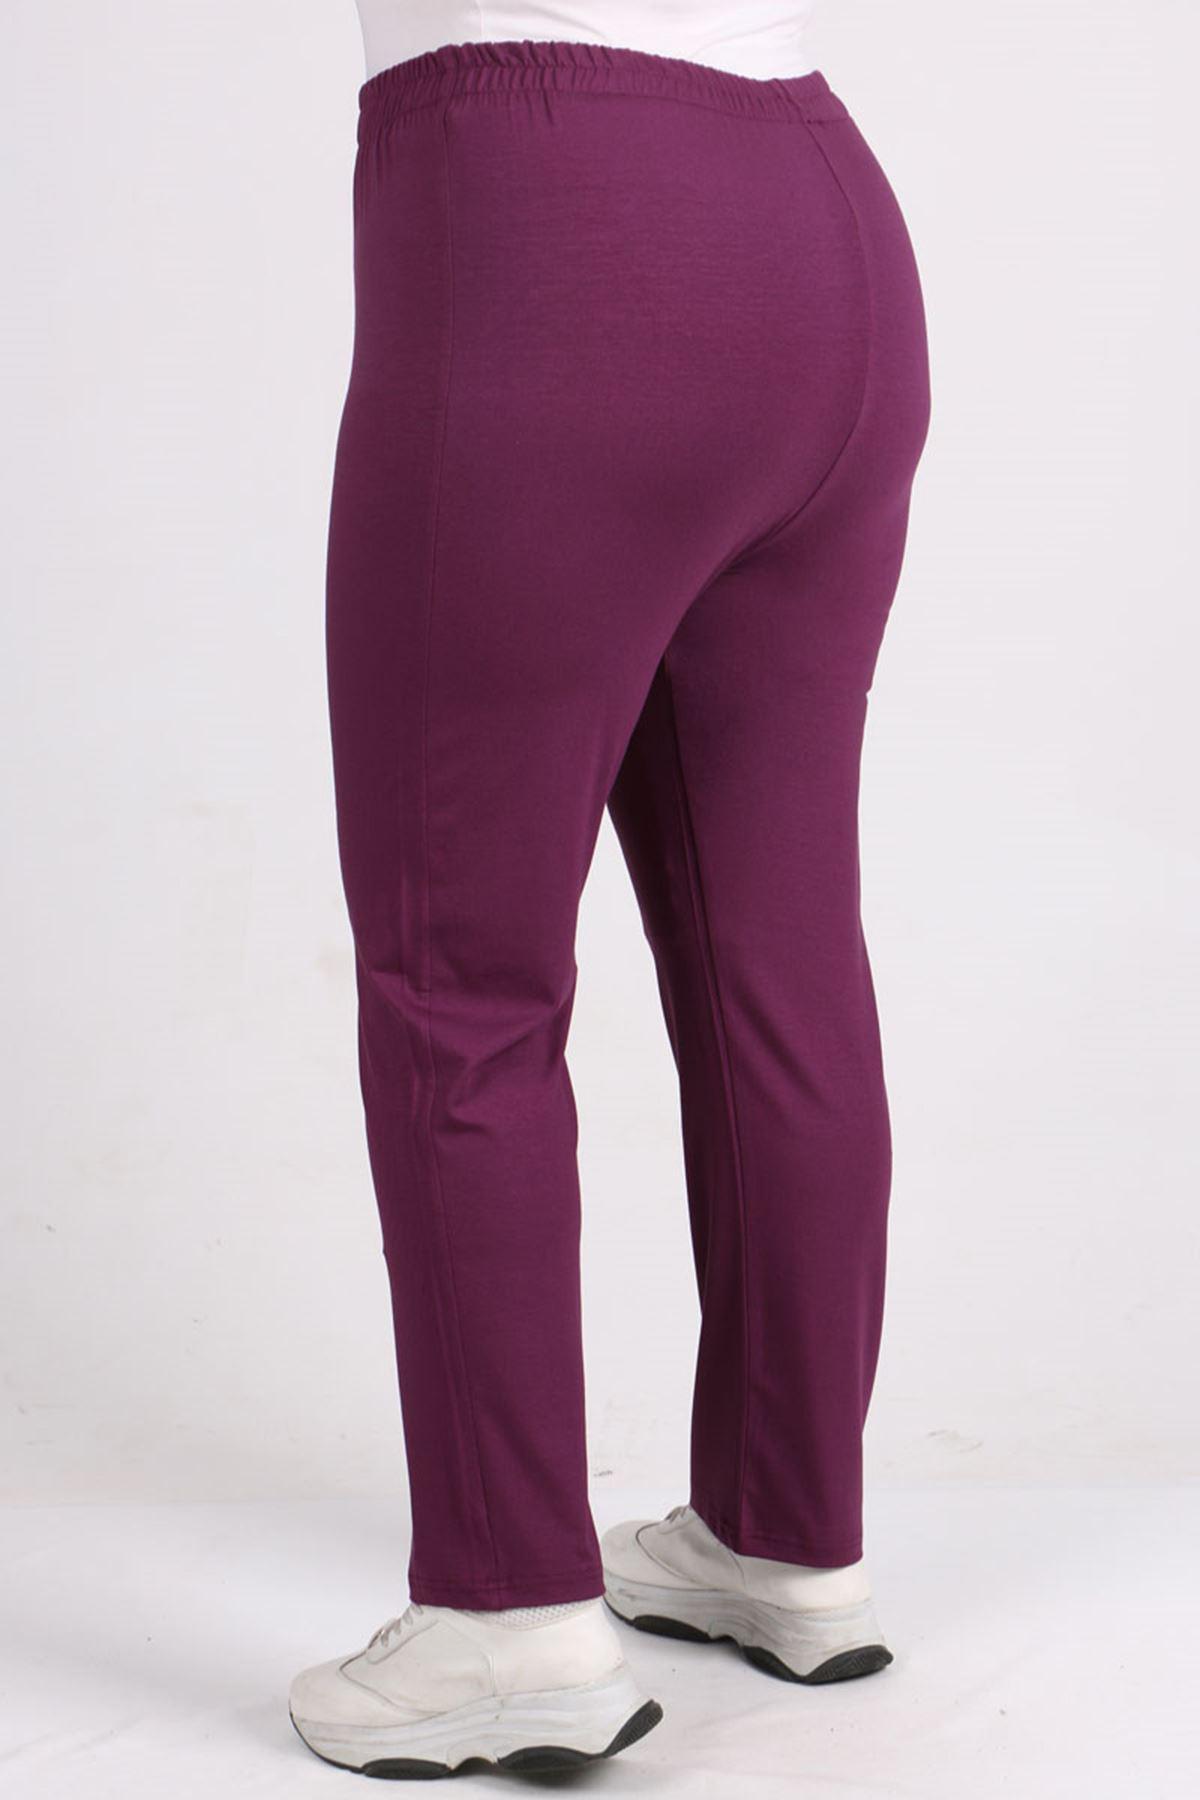 9057 Plus Size High Waist Elastic Pants - Lilac